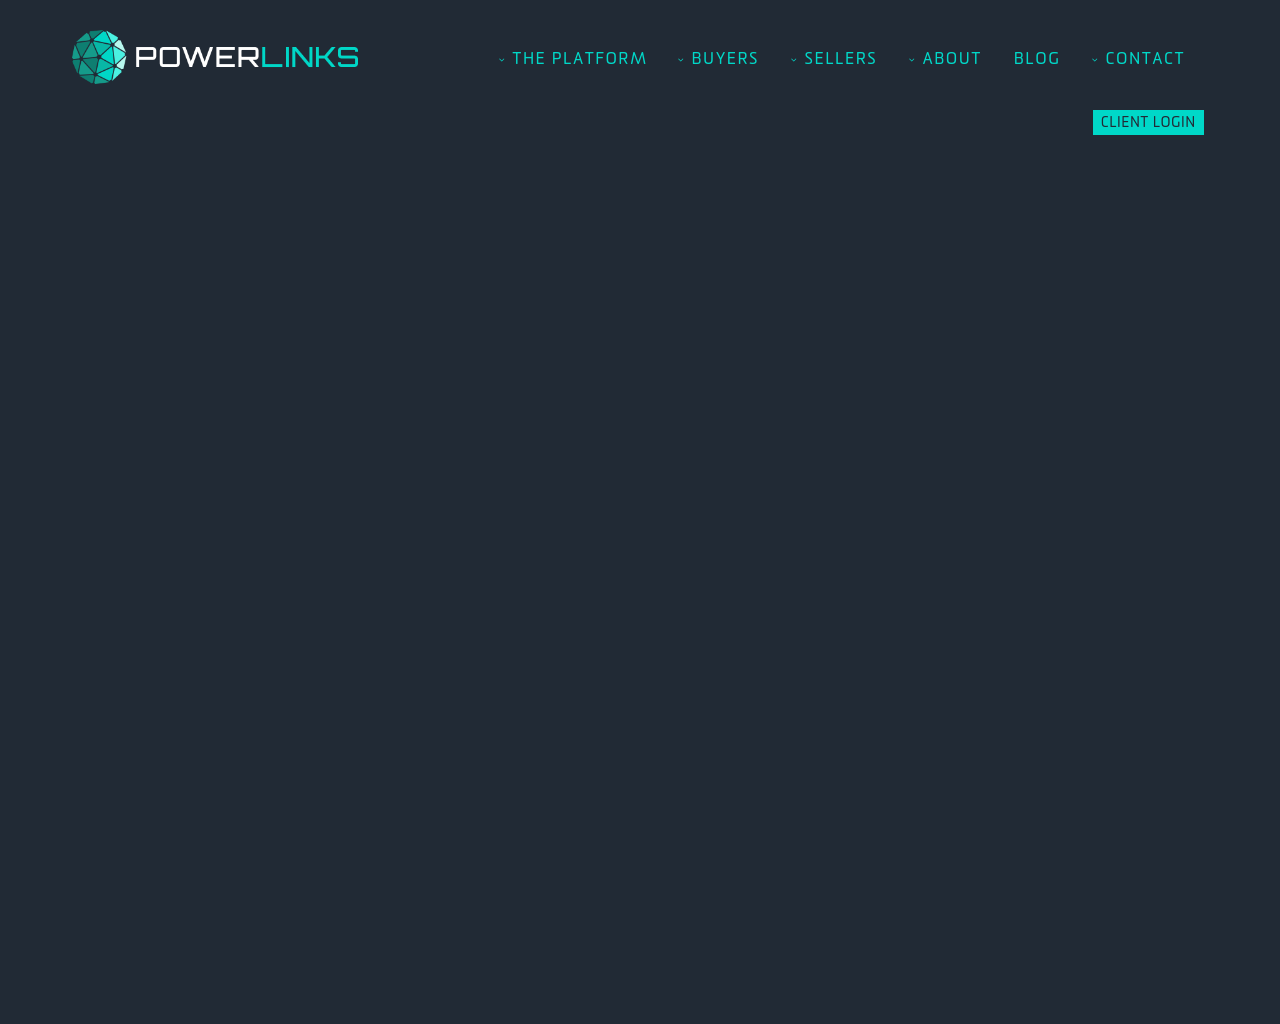 PowerLinks-Advertising-Reviews-Pricing